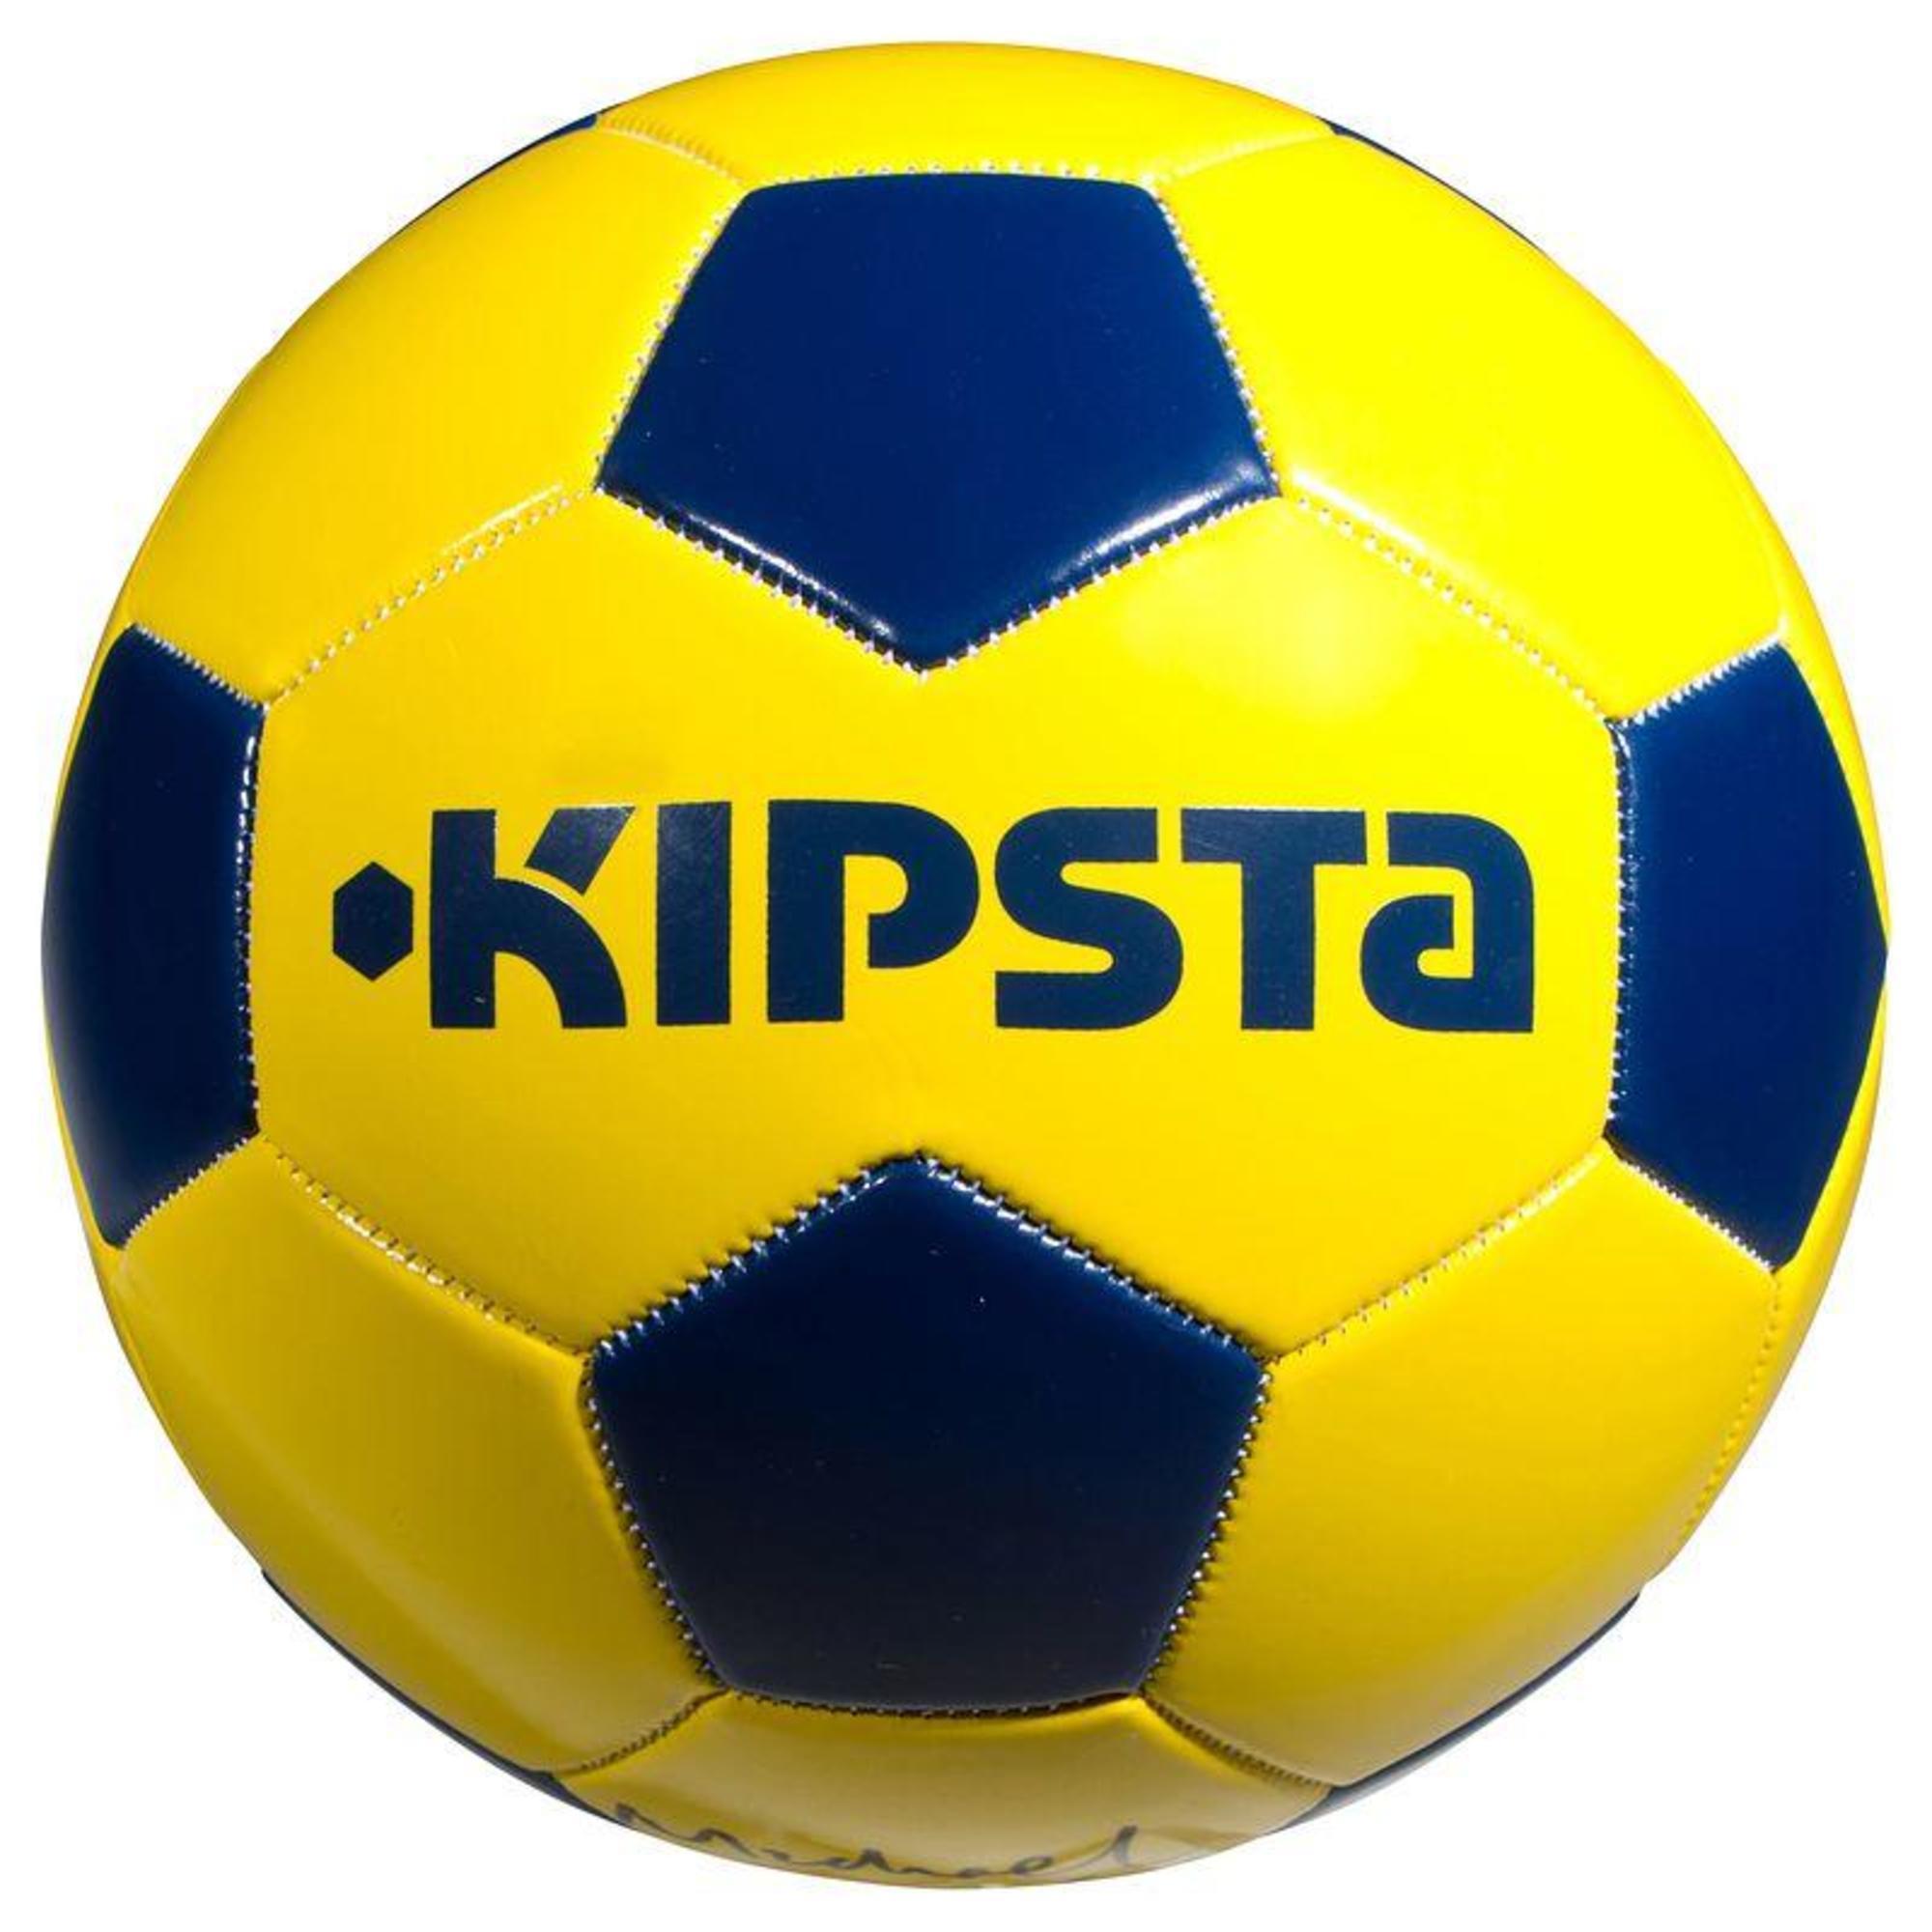 ballon de football first kick taille 4 enfant de 8 12 ans jaune bleu kipsta by decathlon. Black Bedroom Furniture Sets. Home Design Ideas